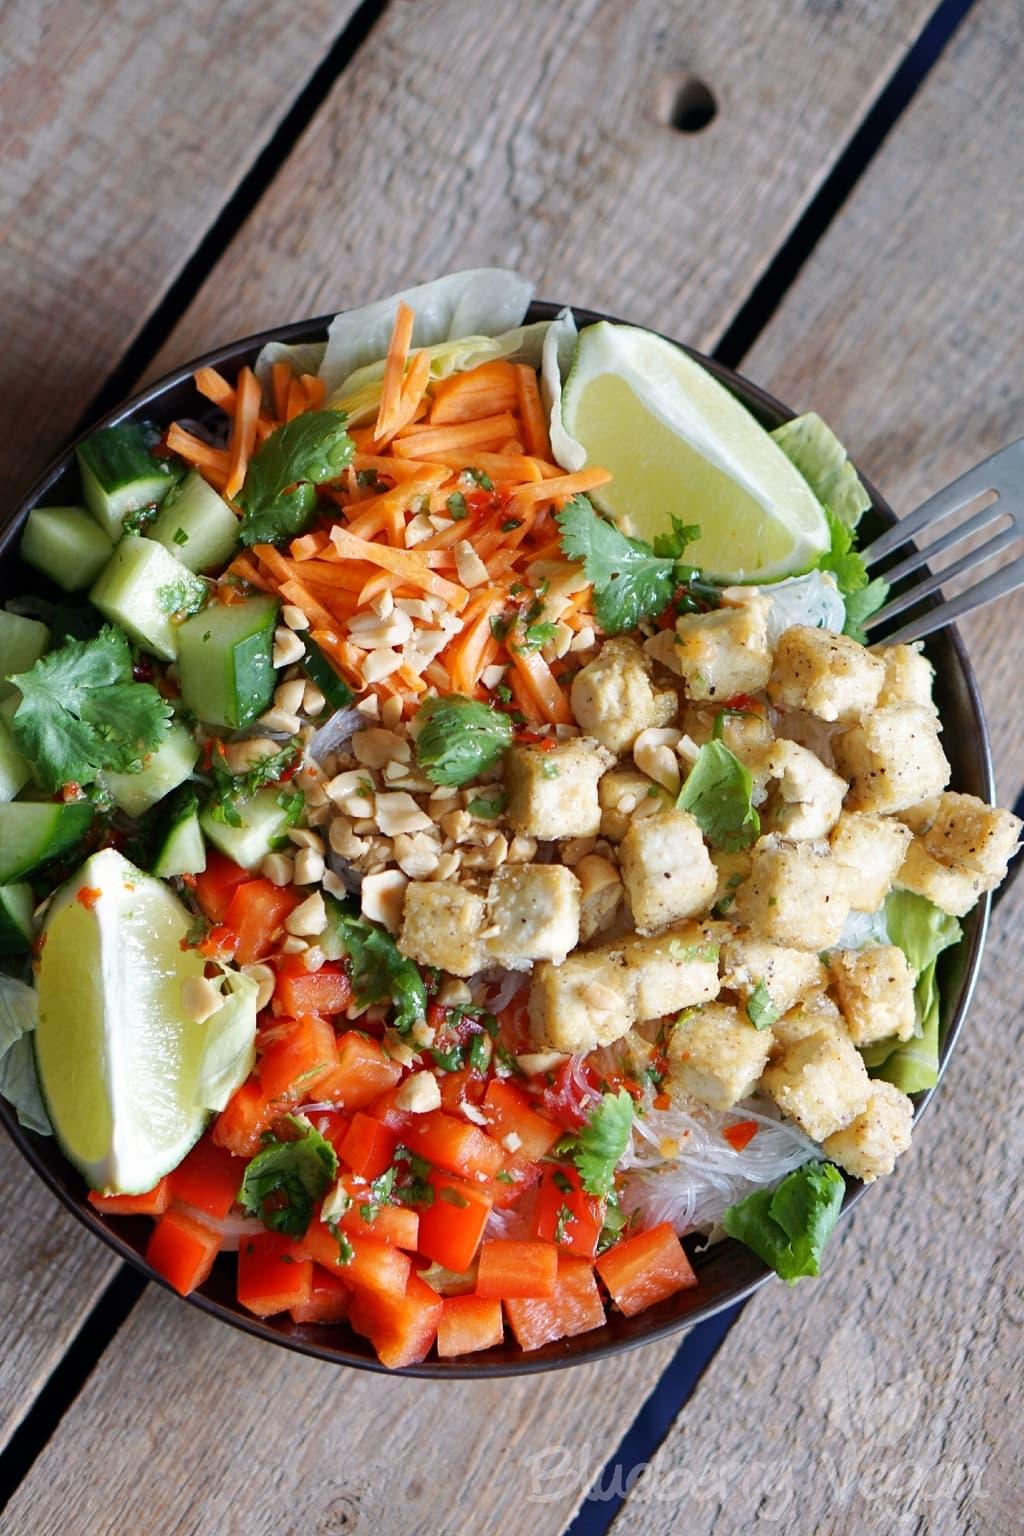 Colorful Glass Noodle Salad with Crispy Tofu and Chili Lime Dressing